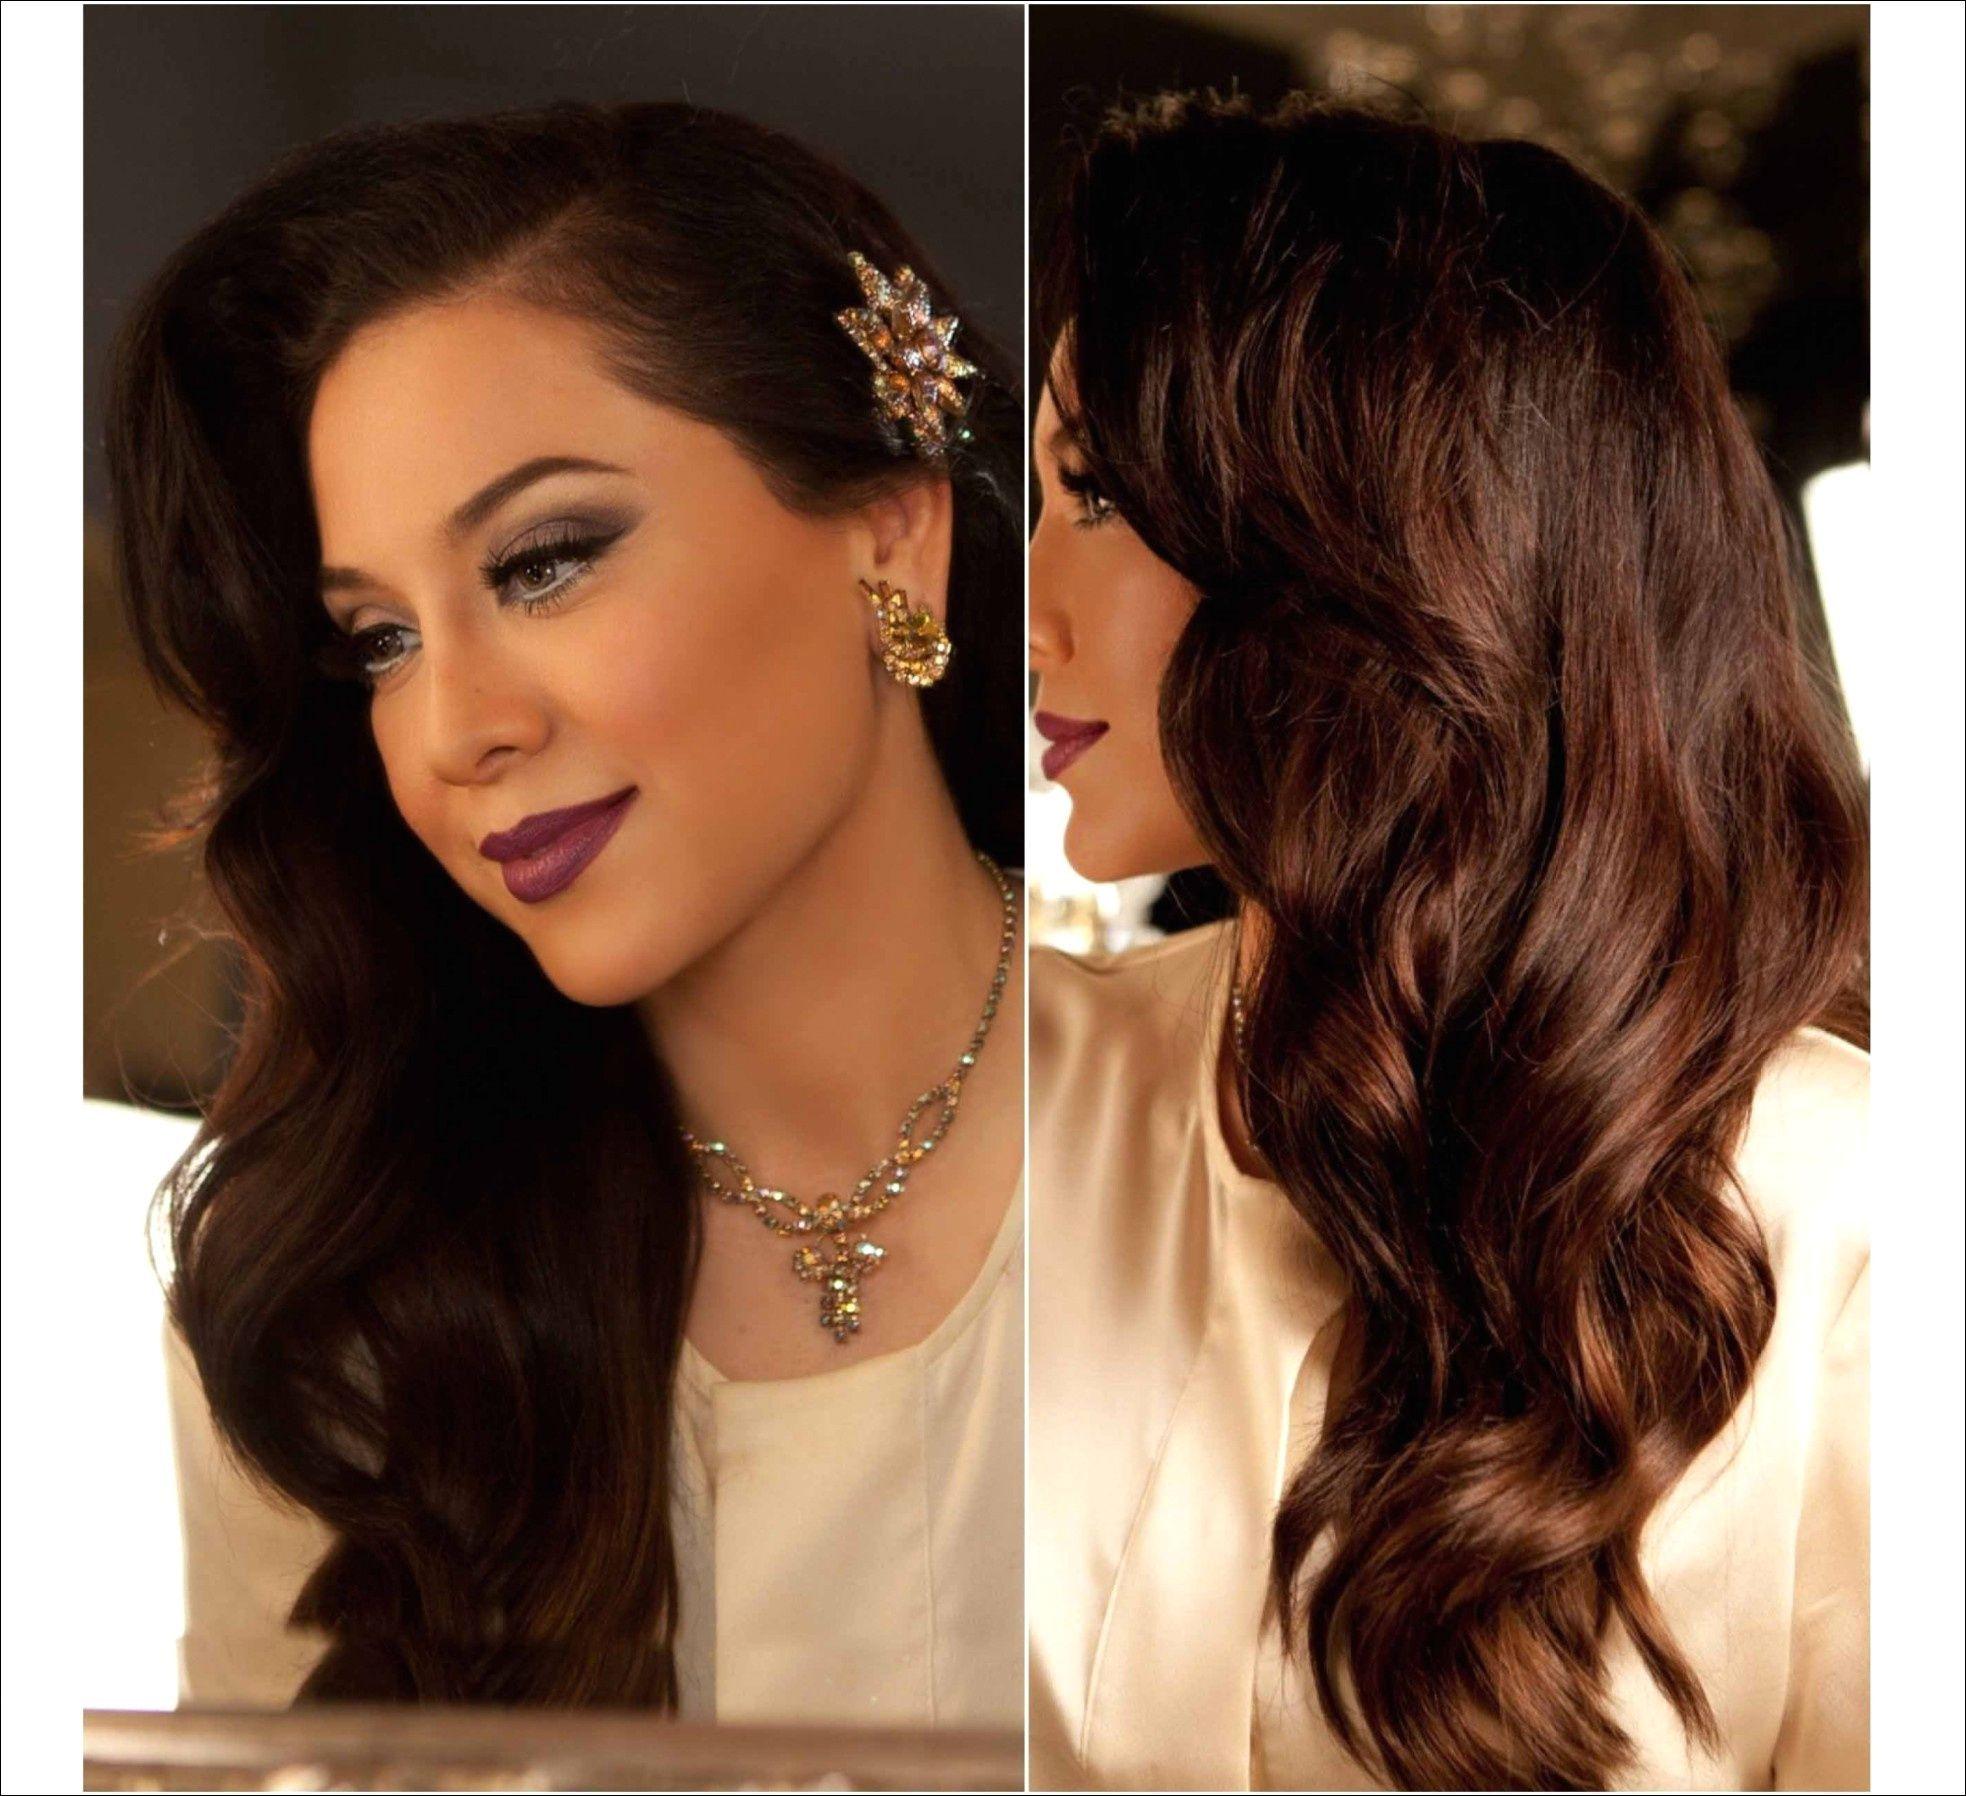 31 Top Image Roaring 20s Hairstyles Long In 2020 Glamour Hair Hollywood Hair Long Hair Styles